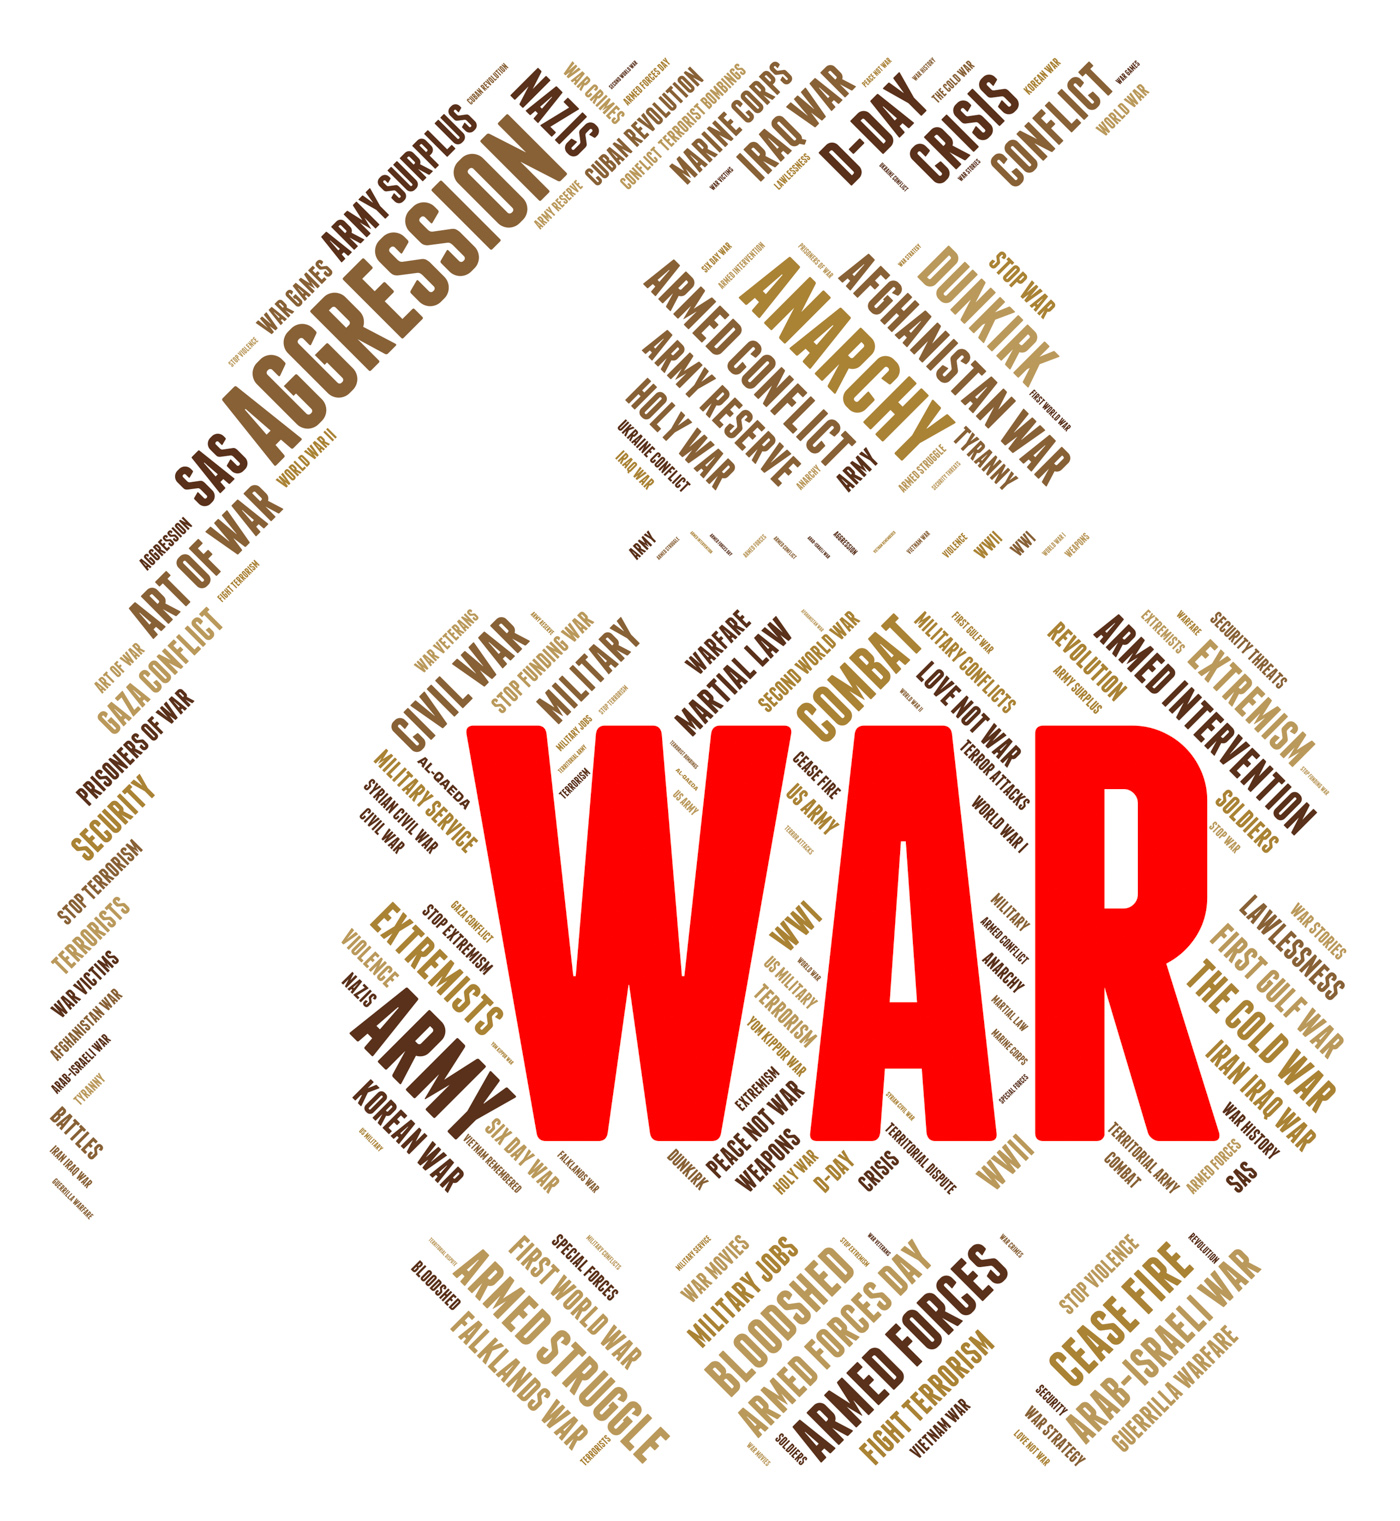 War Word Represents Military Action And Battle, Battle, Fights, Warfare, War, HQ Photo